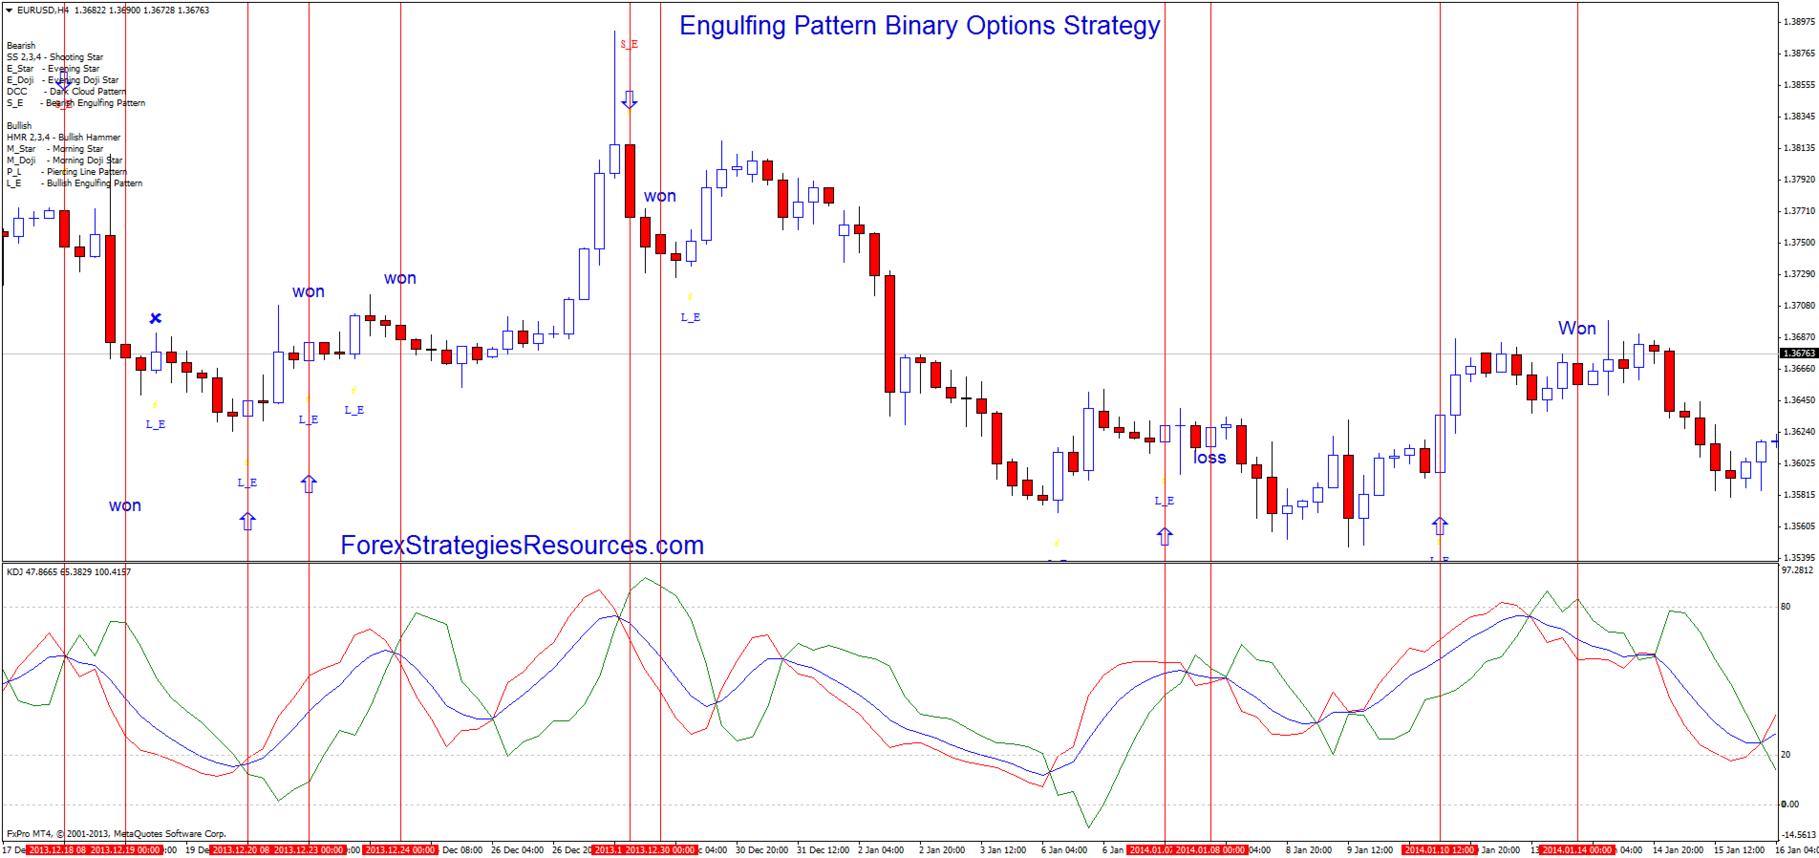 Binary options engulfing strategy bitcoins per block chart 1117a